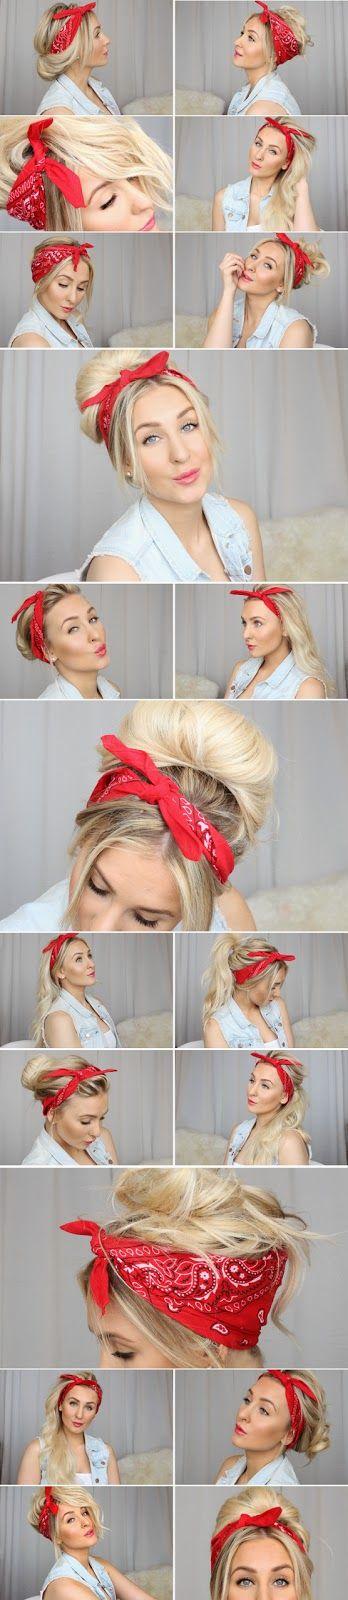 bad-hair-day-frisrytips-bandana-sjal-hiilen-sminkblogg-skönhetsblogg.jpg 348×1600 pixels